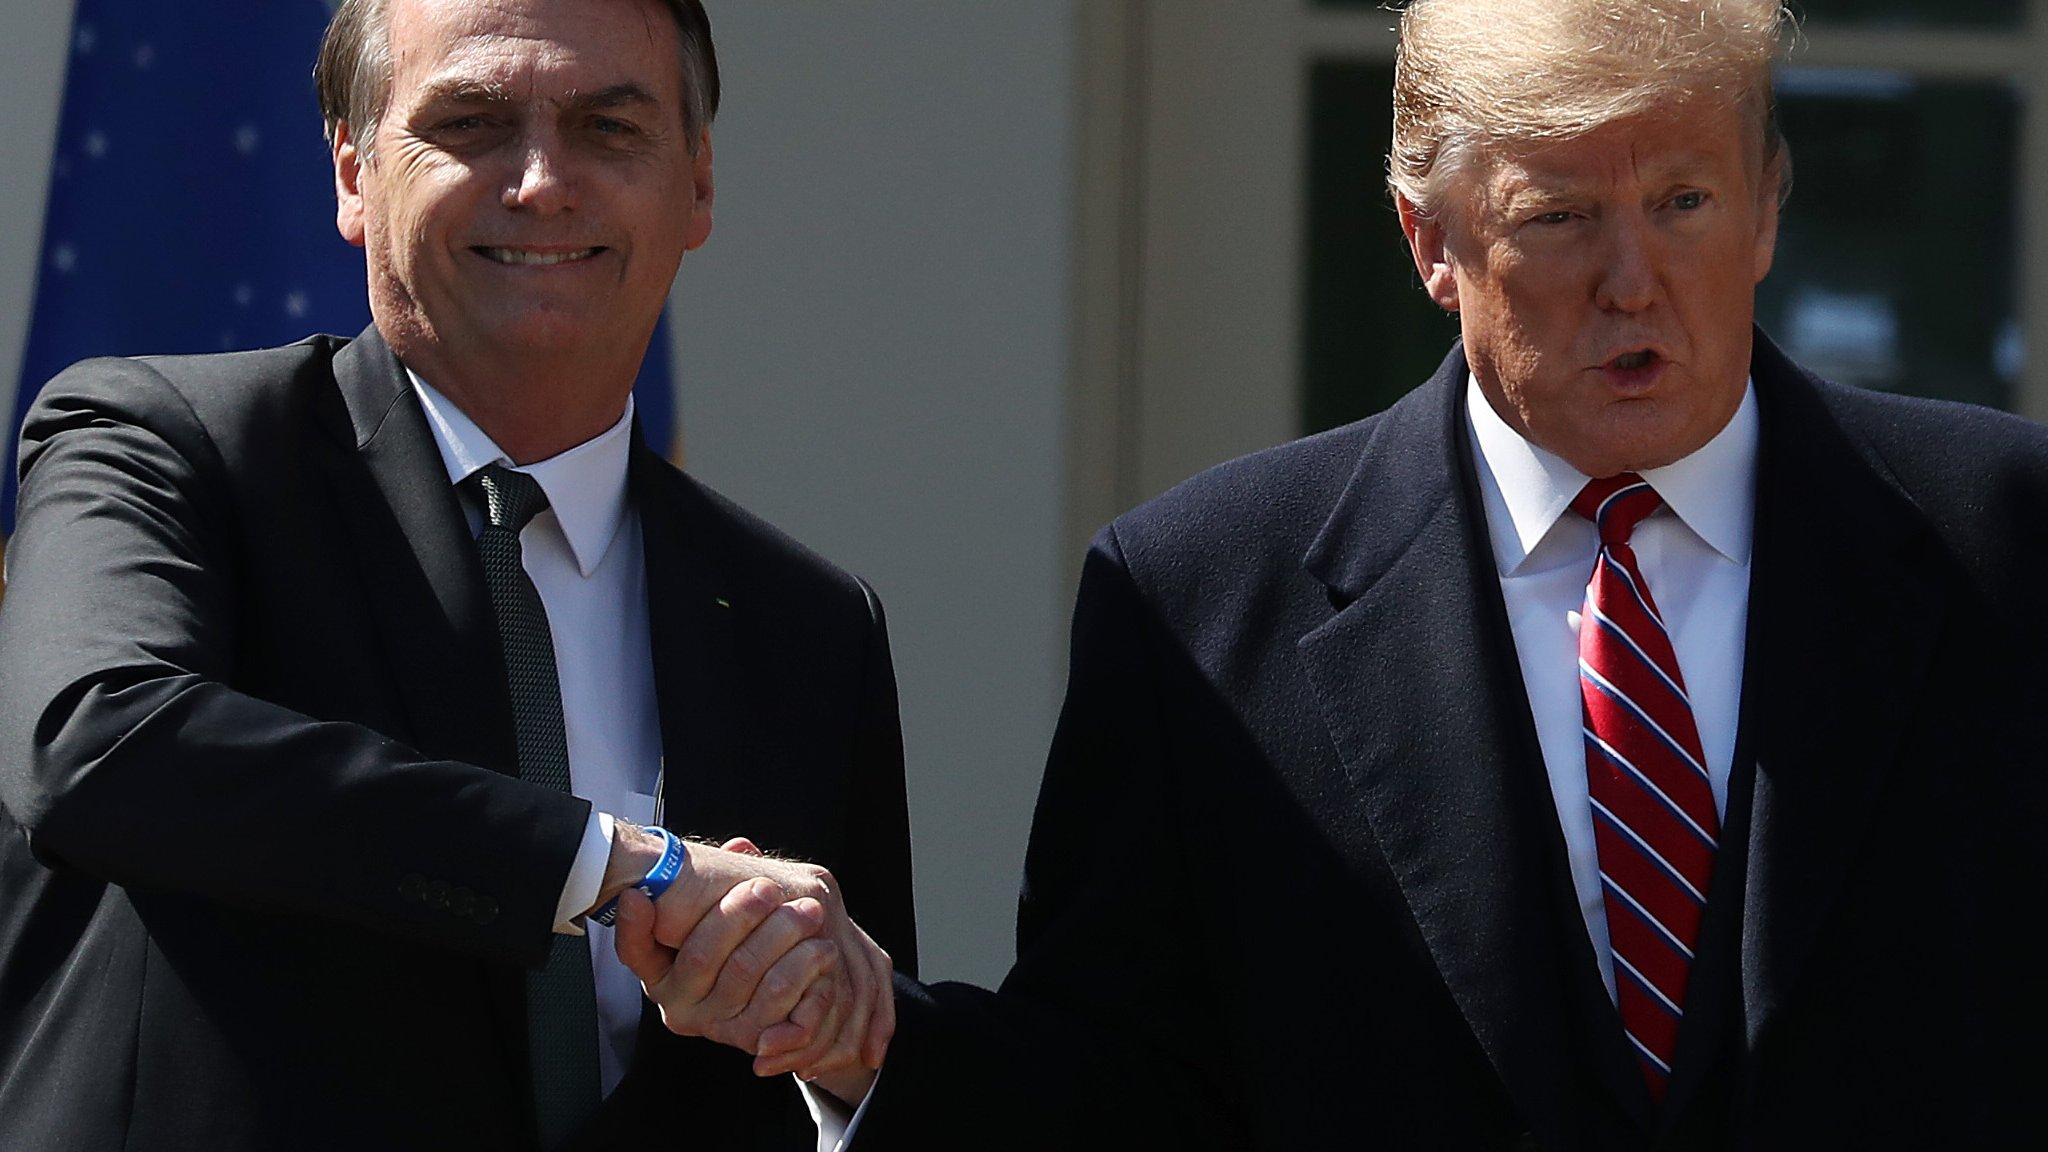 Bolsonaro visit: A tale of two Trumps